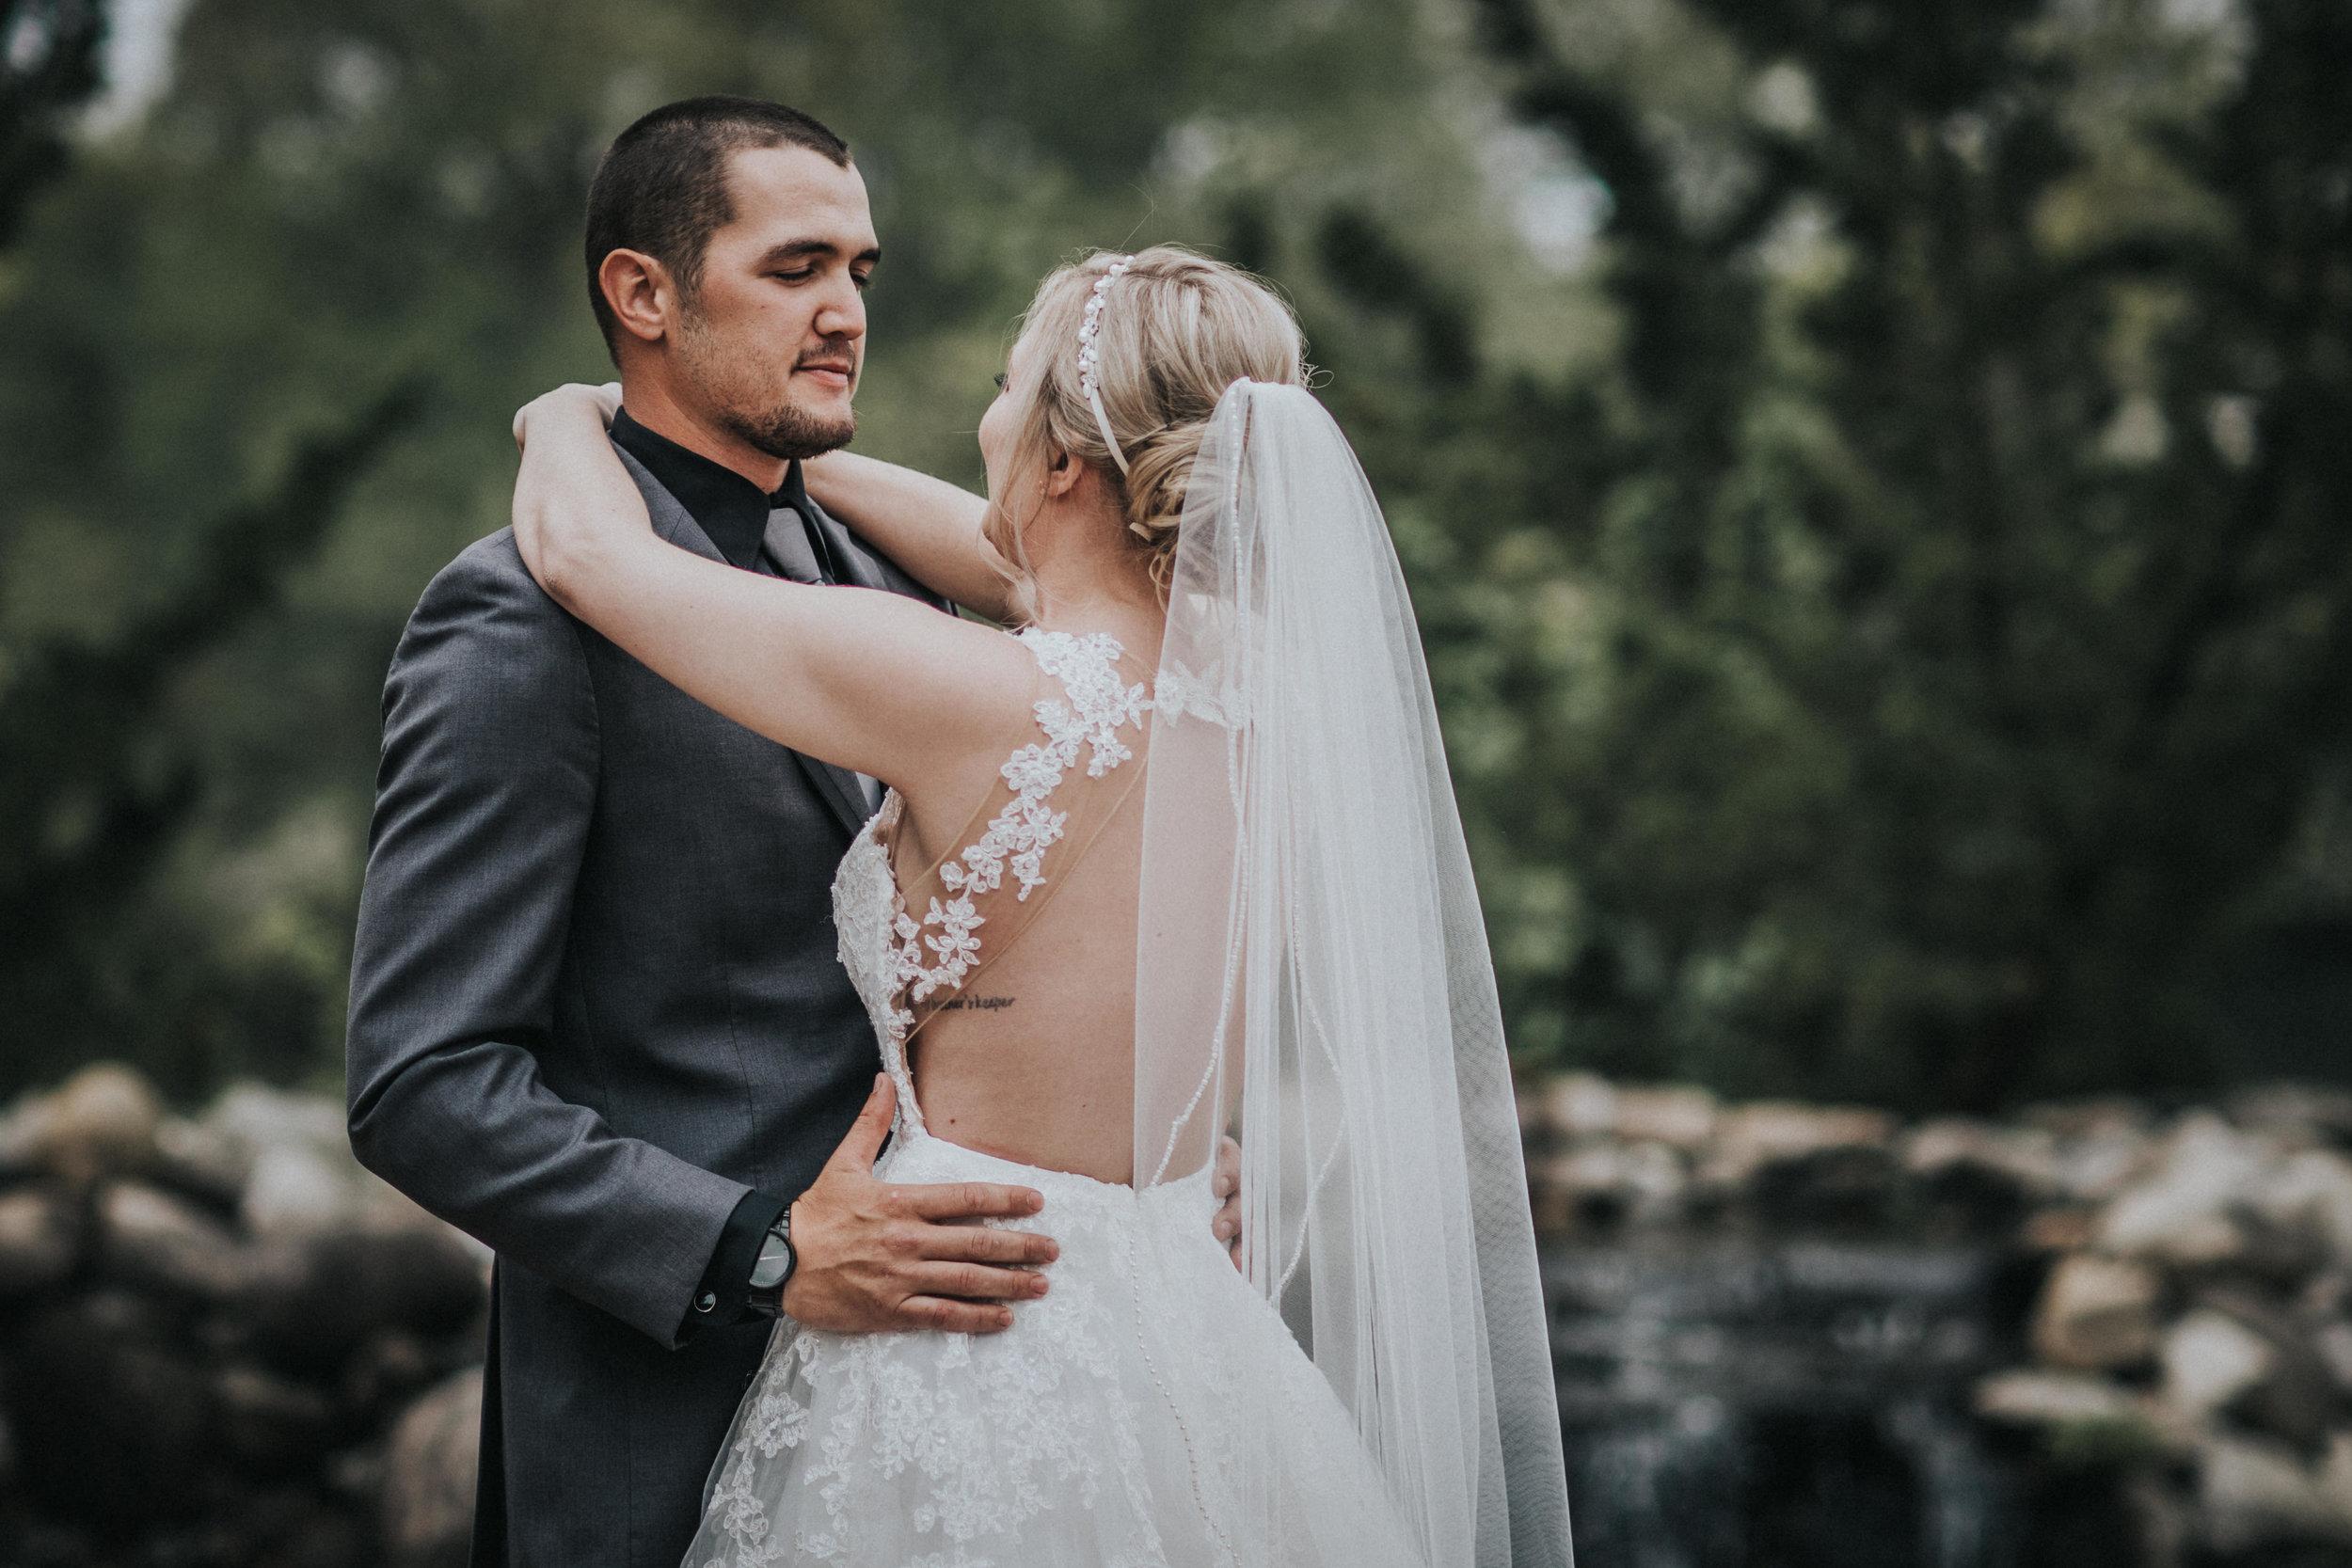 New-Jersey-Wedding-Photographer-Megan&Nick-FirstLooks-52.jpg